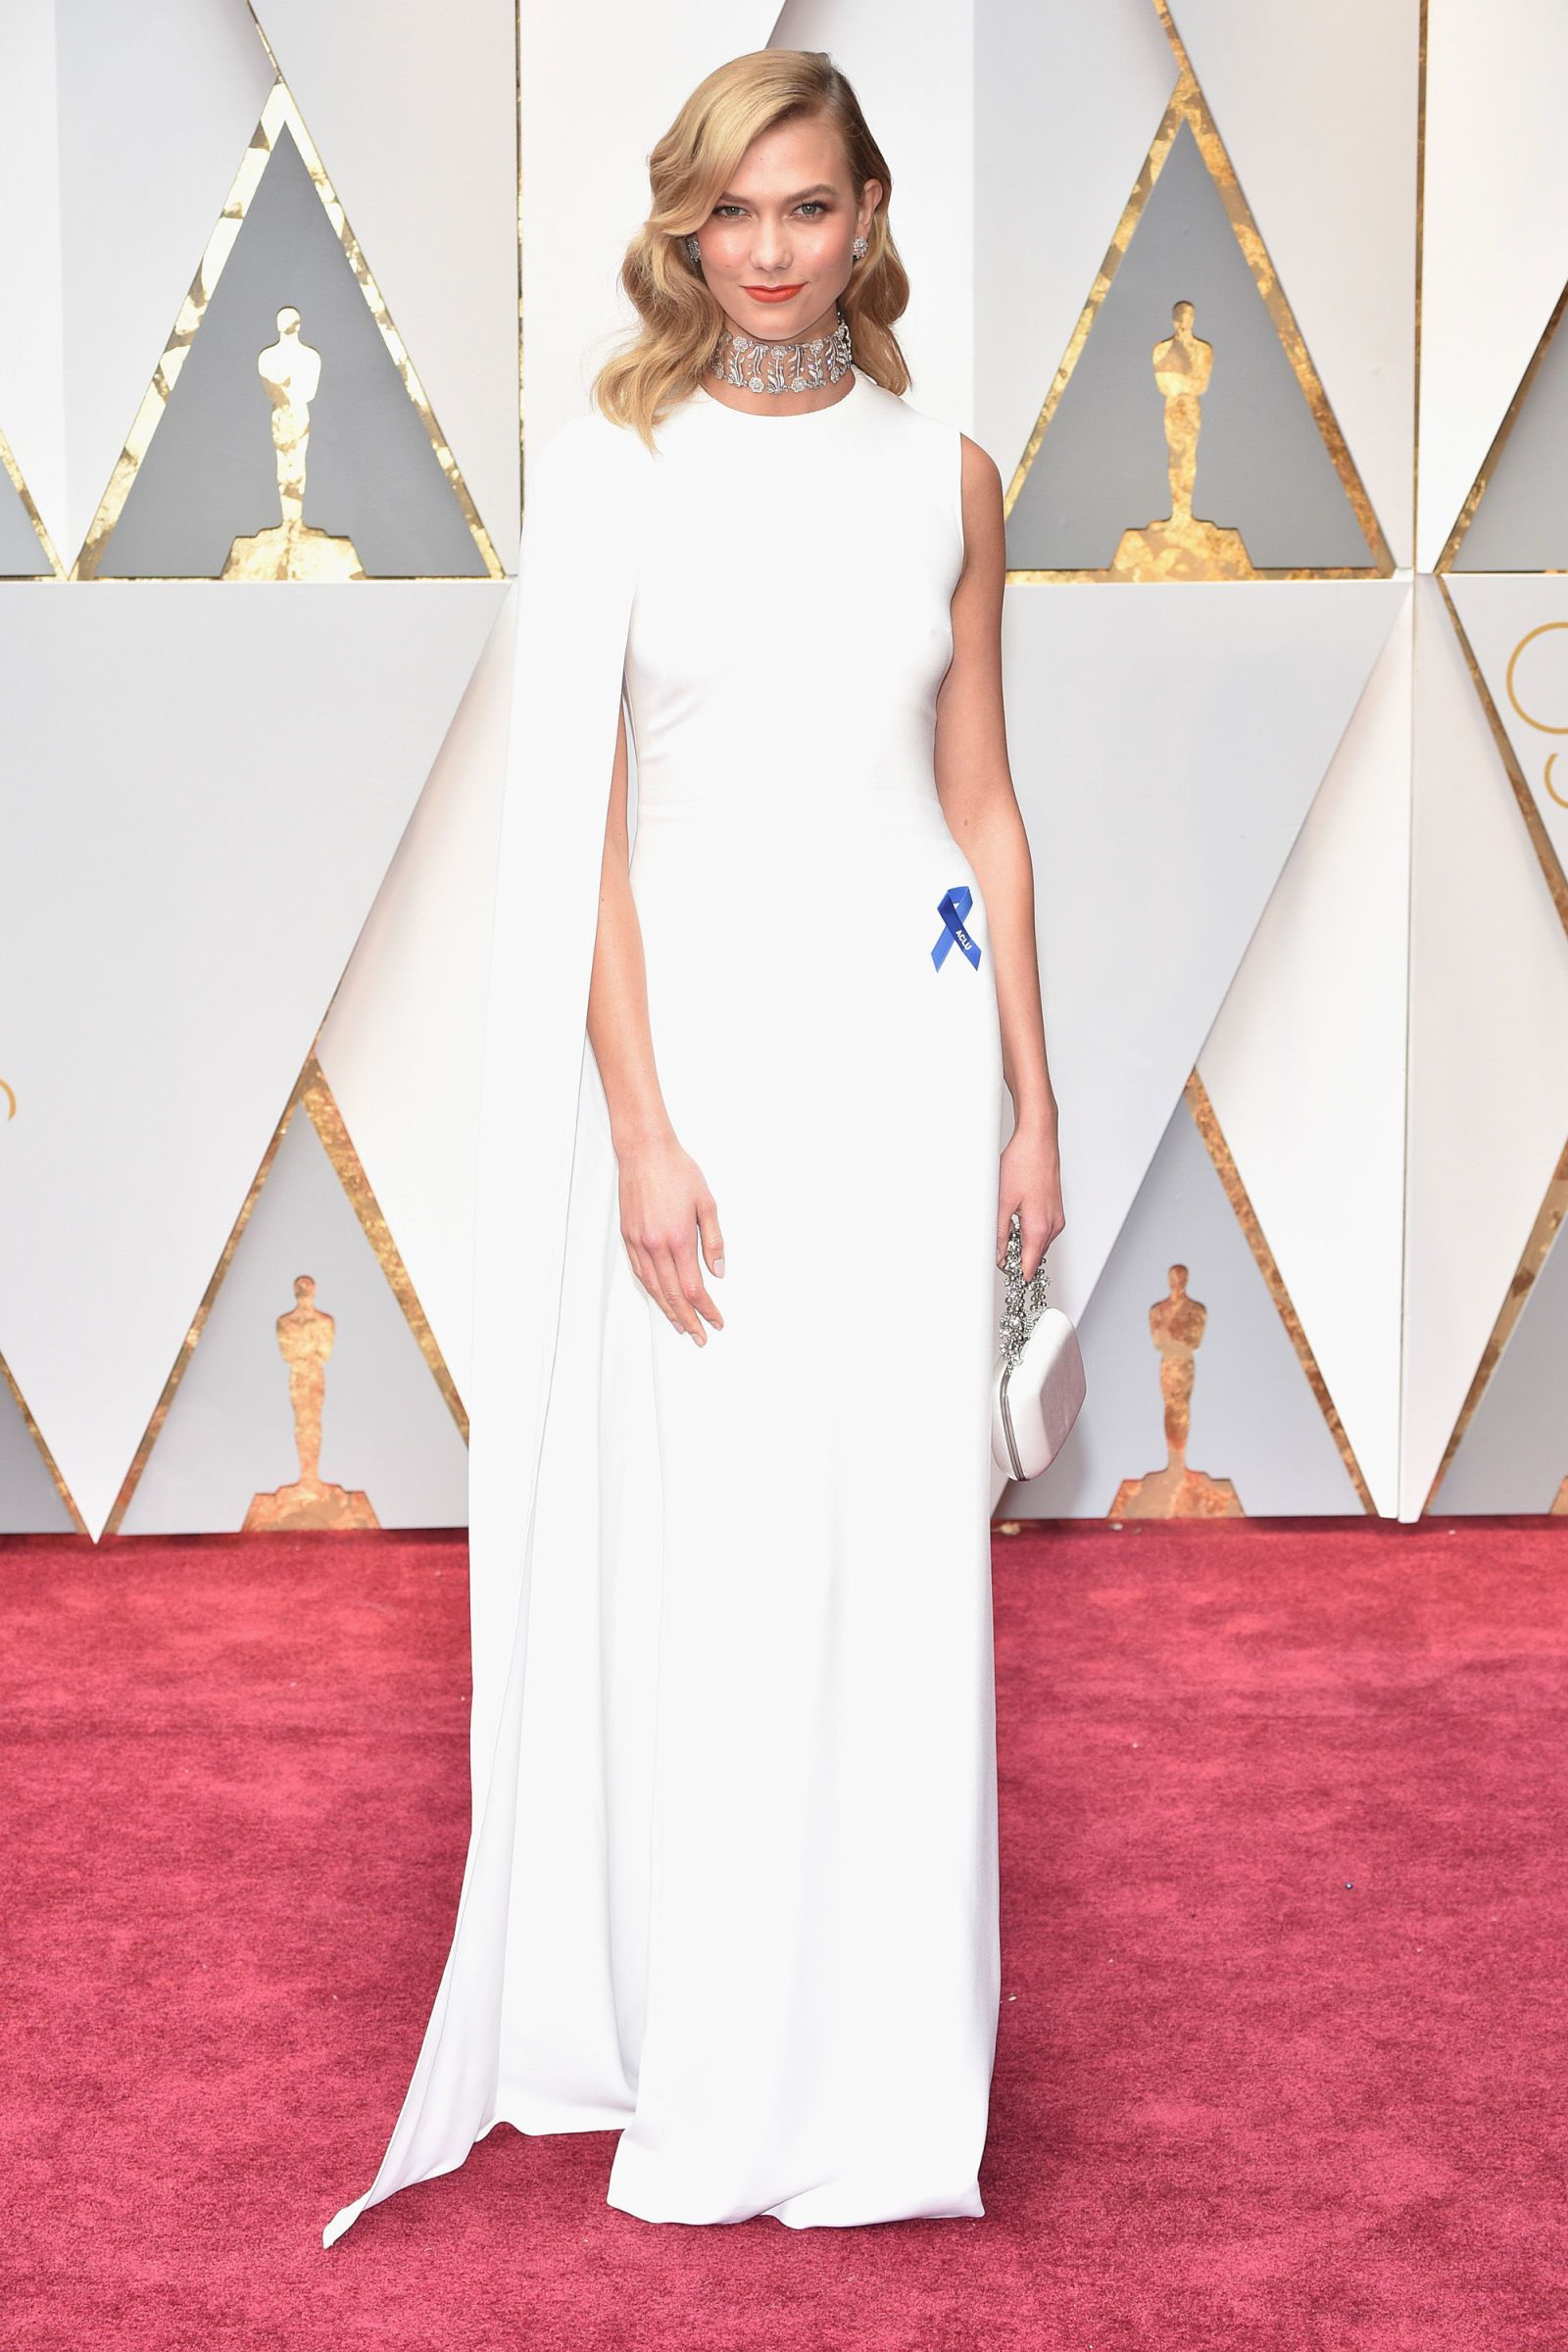 Karlie Kloss on the Oscars Red Carpet, WOW!